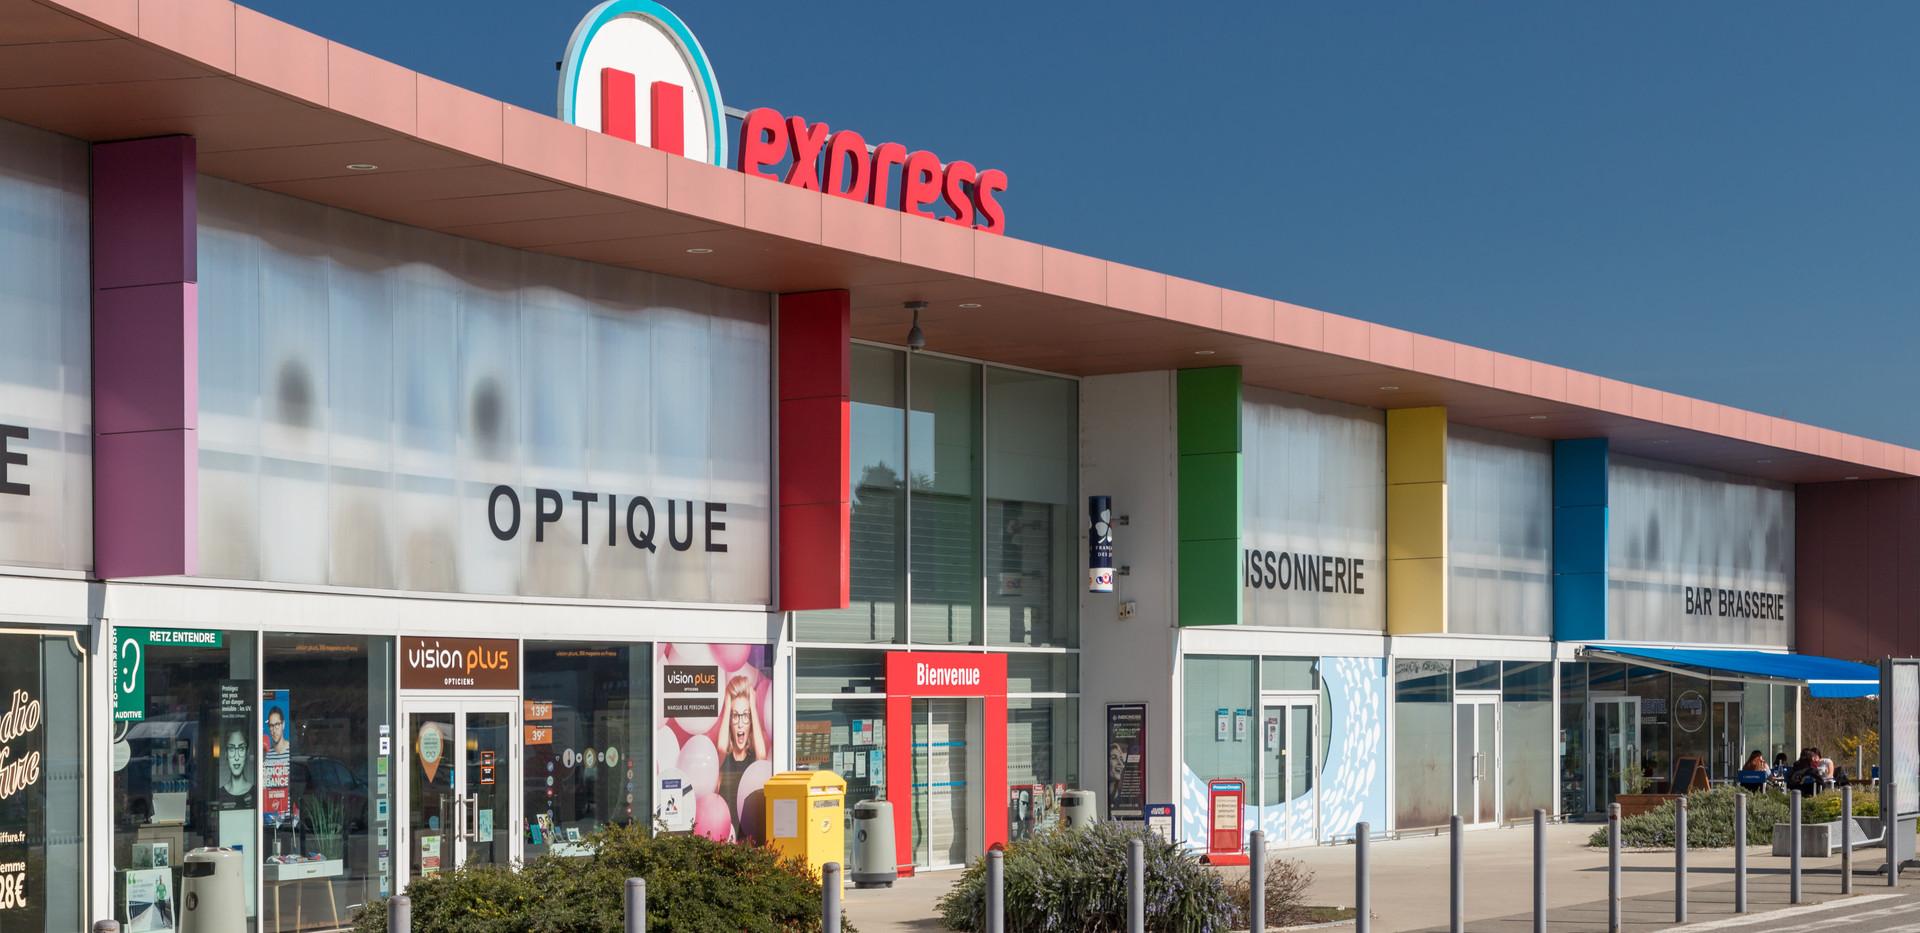 U Express Saint Pere en retz-3comp.jpg